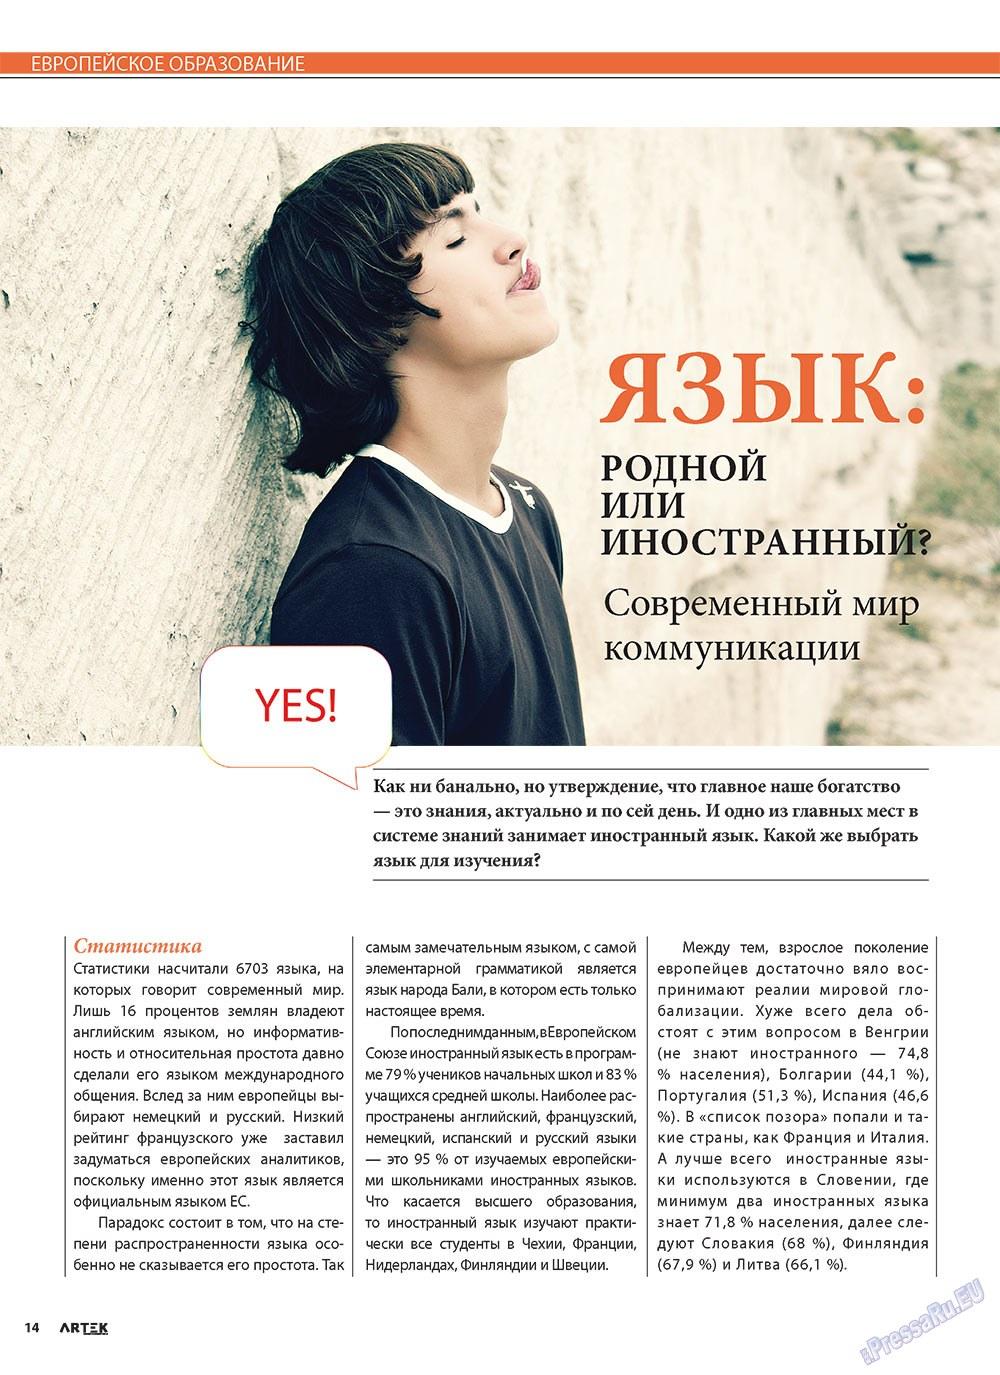 Артек (журнал). 2010 год, номер 6, стр. 16